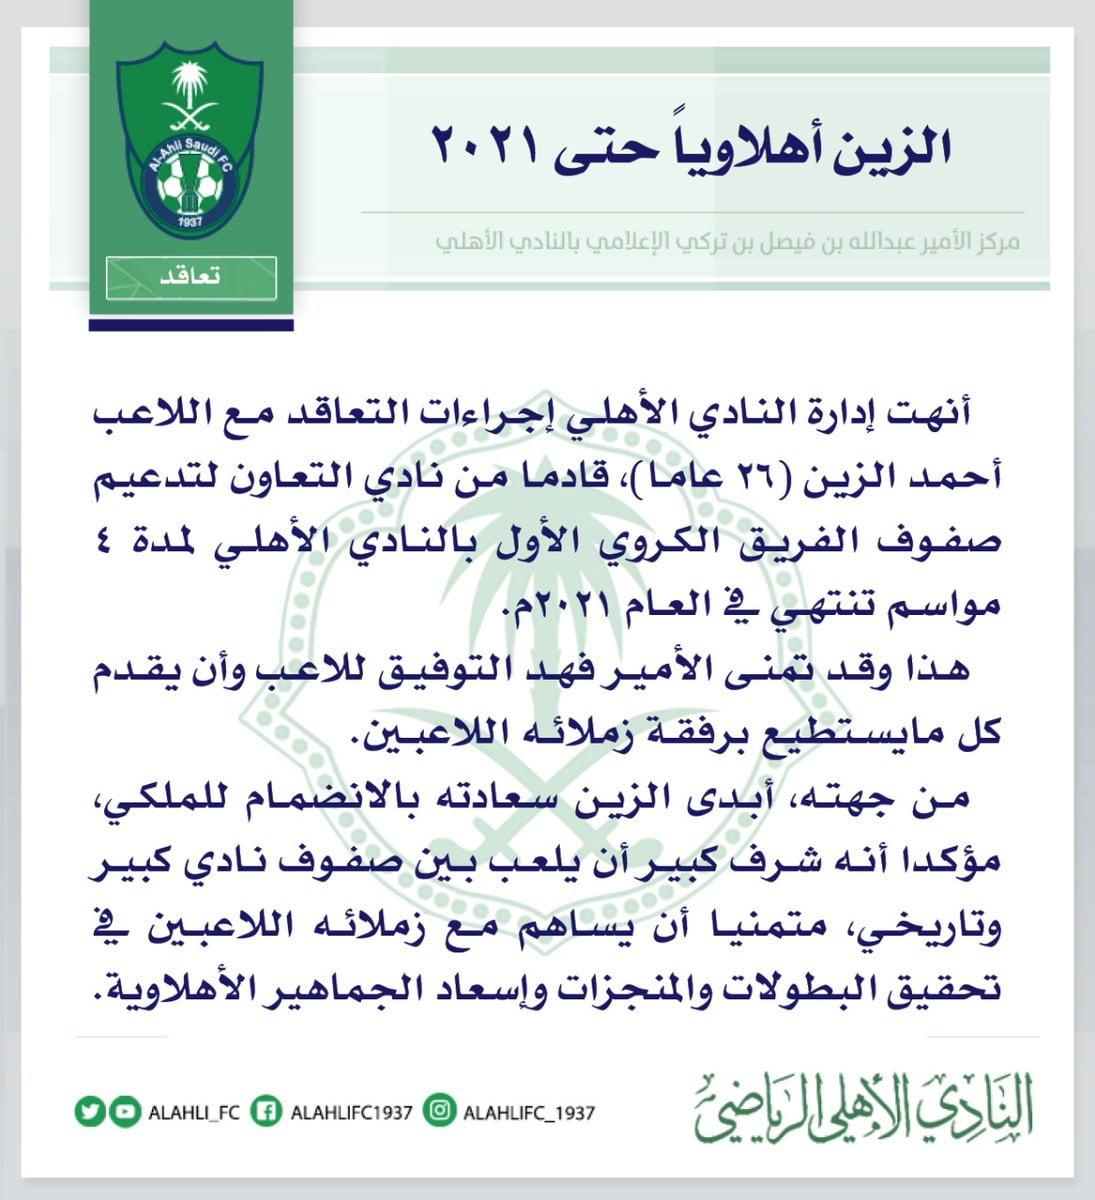 DC3sPlAWsAAZB 5 - الاهلي يتعاقد مع احمد الزين